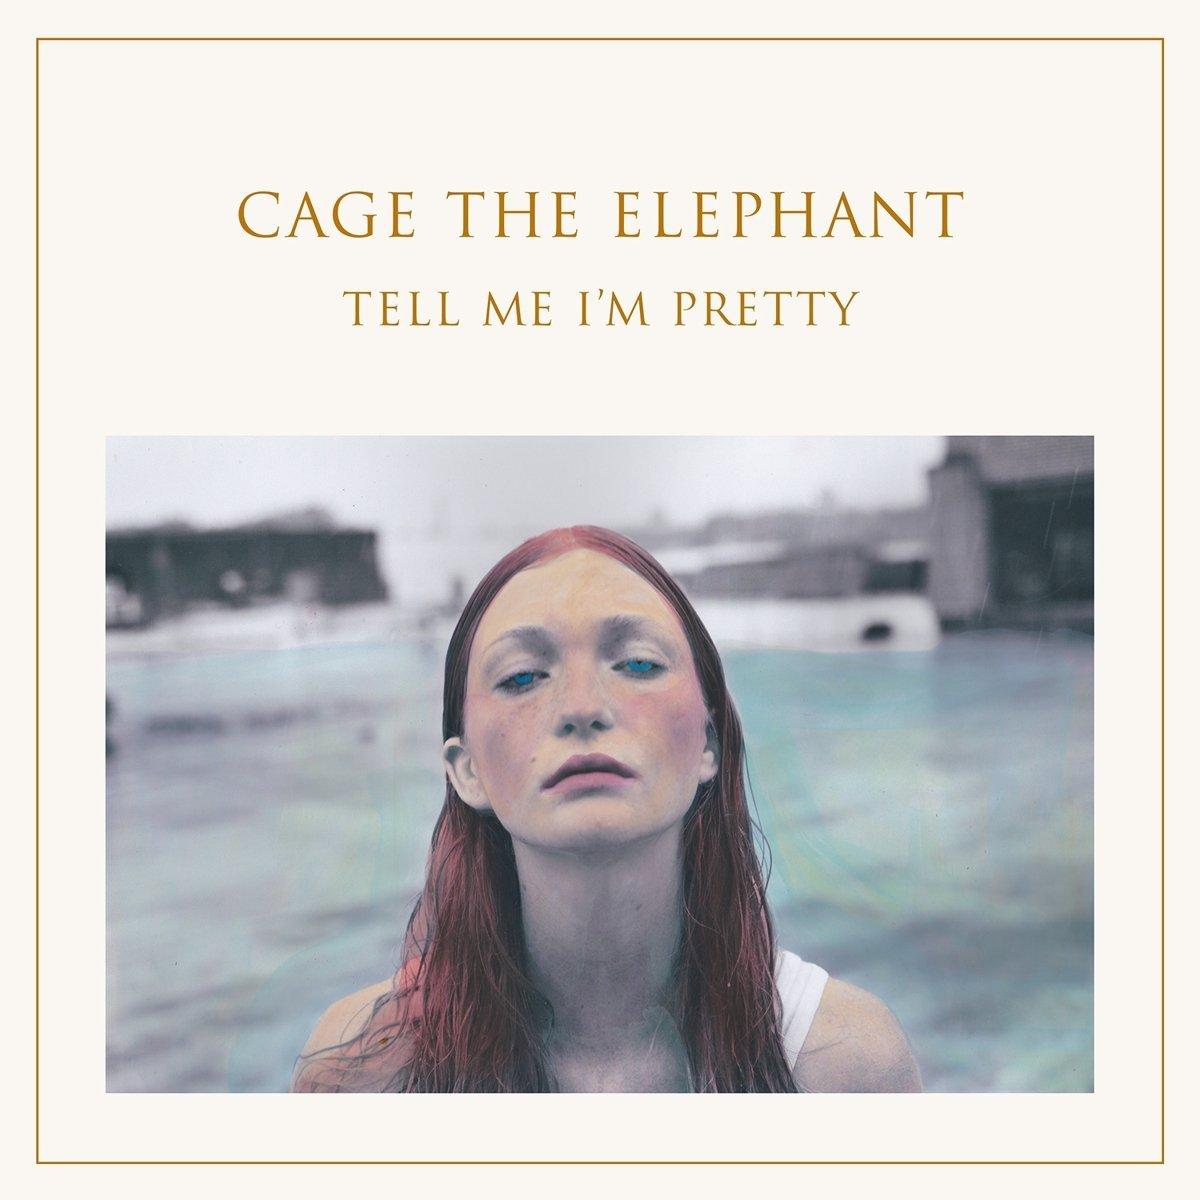 Cage The ElephantВиниловые пластинки<br>Виниловая пластинка<br>